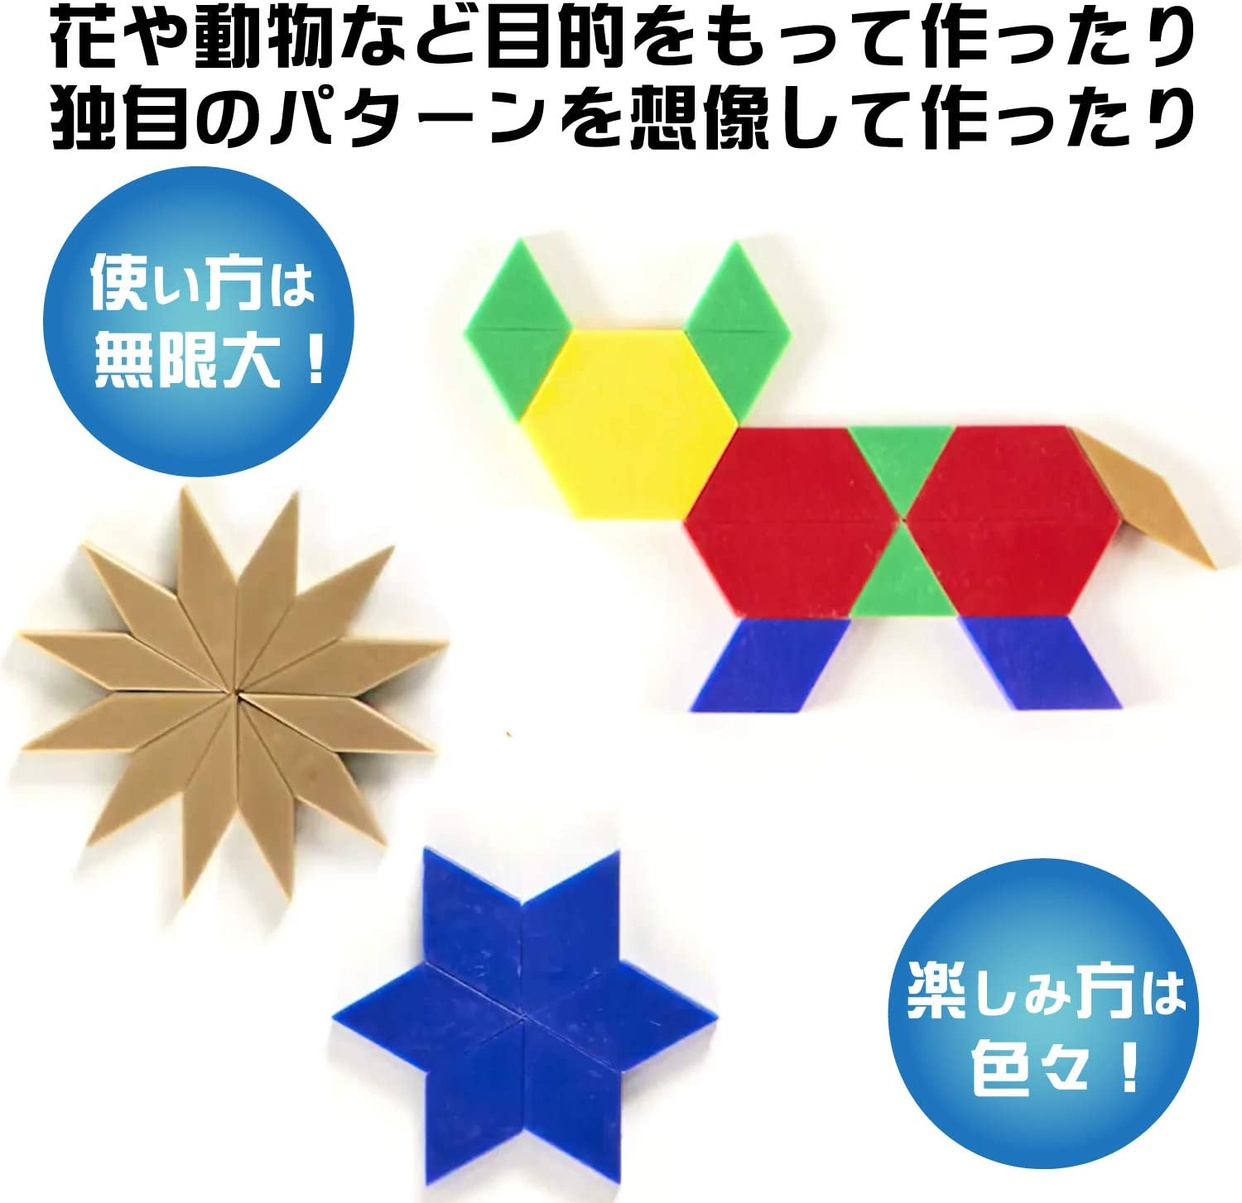 Learning Resources(ラーニングリソーシズ) パターンブロック LER0134の商品画像4